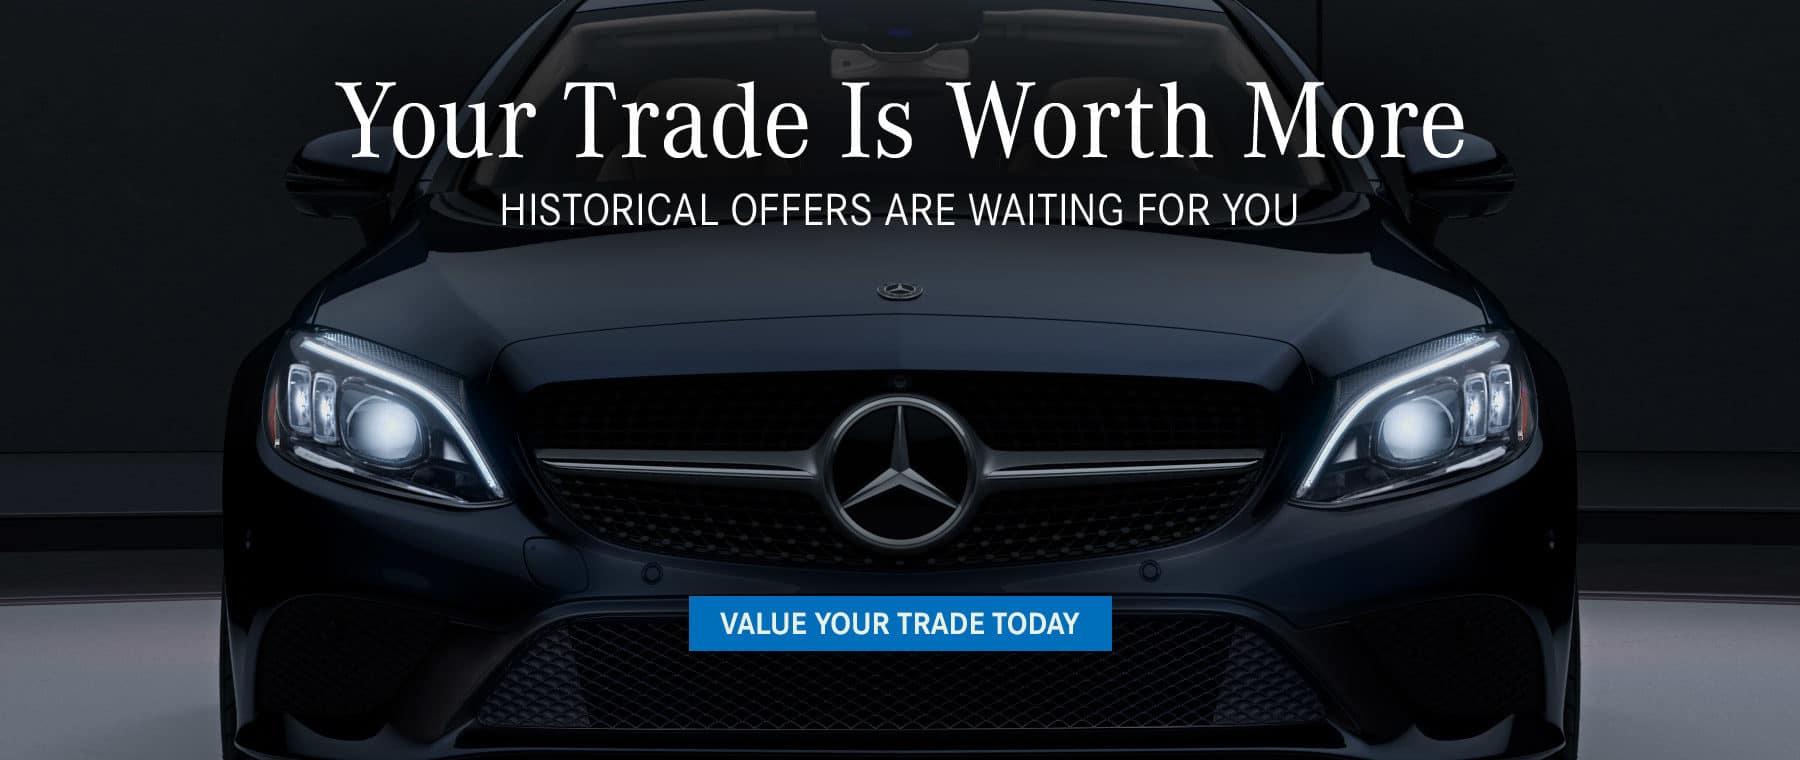 Homepage-Slider-MBS-Trade-Worth-More